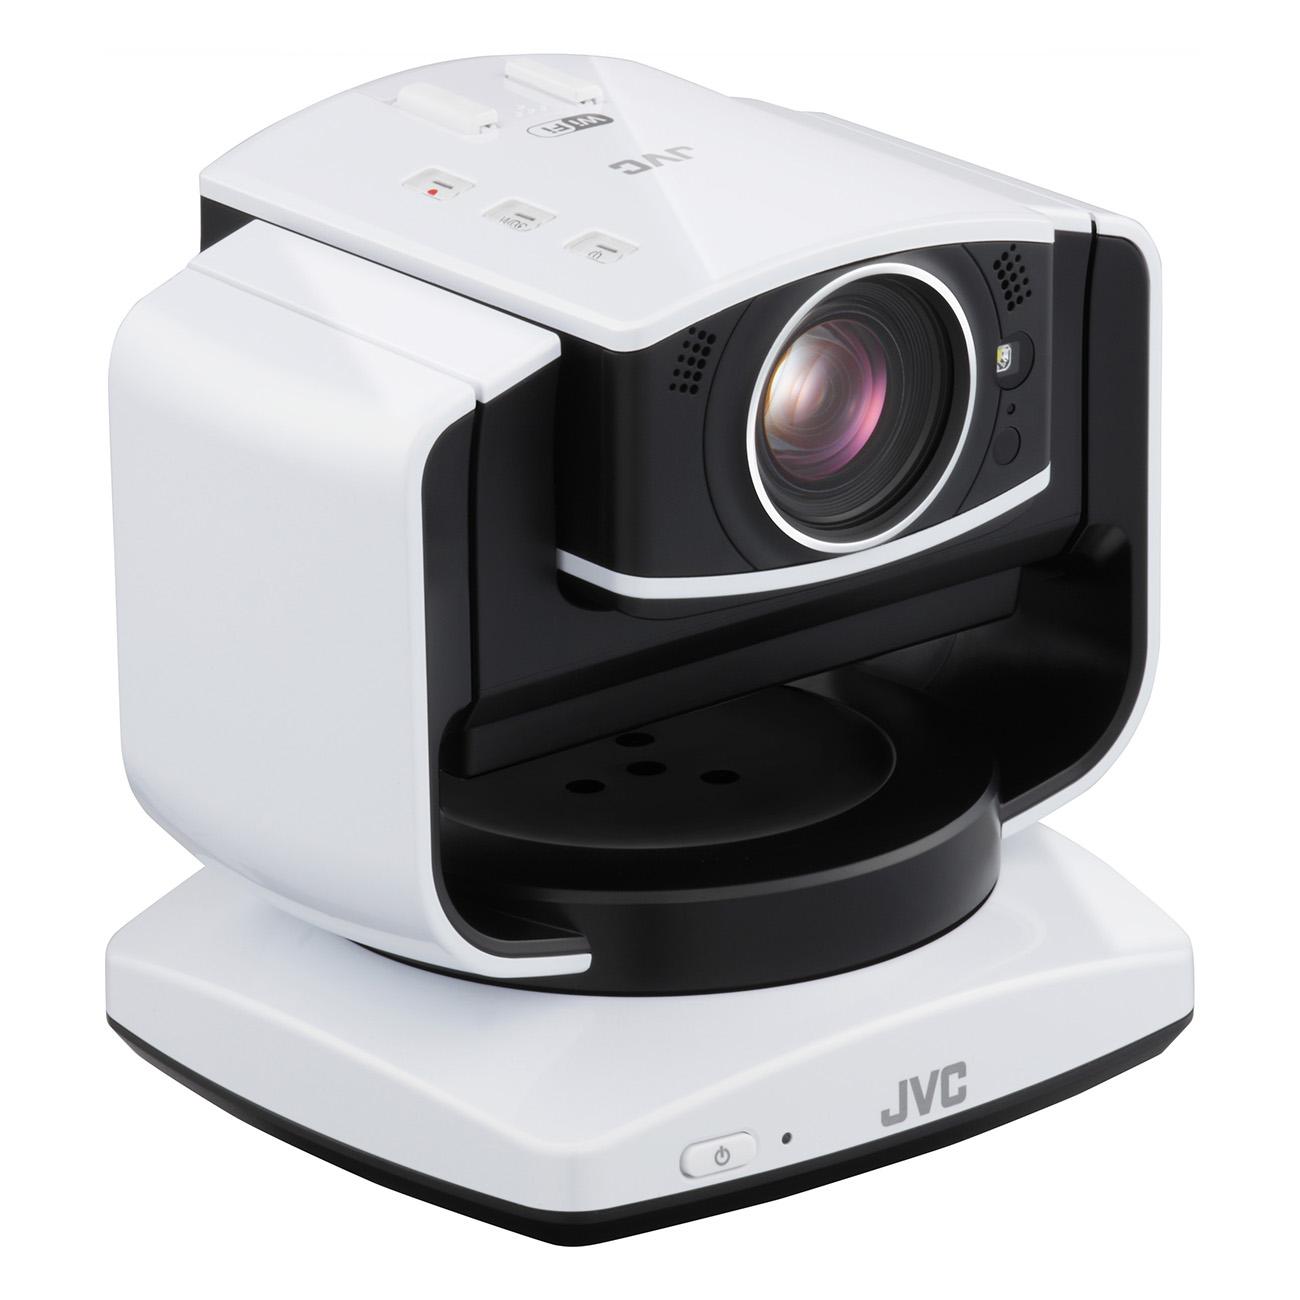 Jvc live streaming internet camera full hd ptz wifi lan sd for Camera streaming live